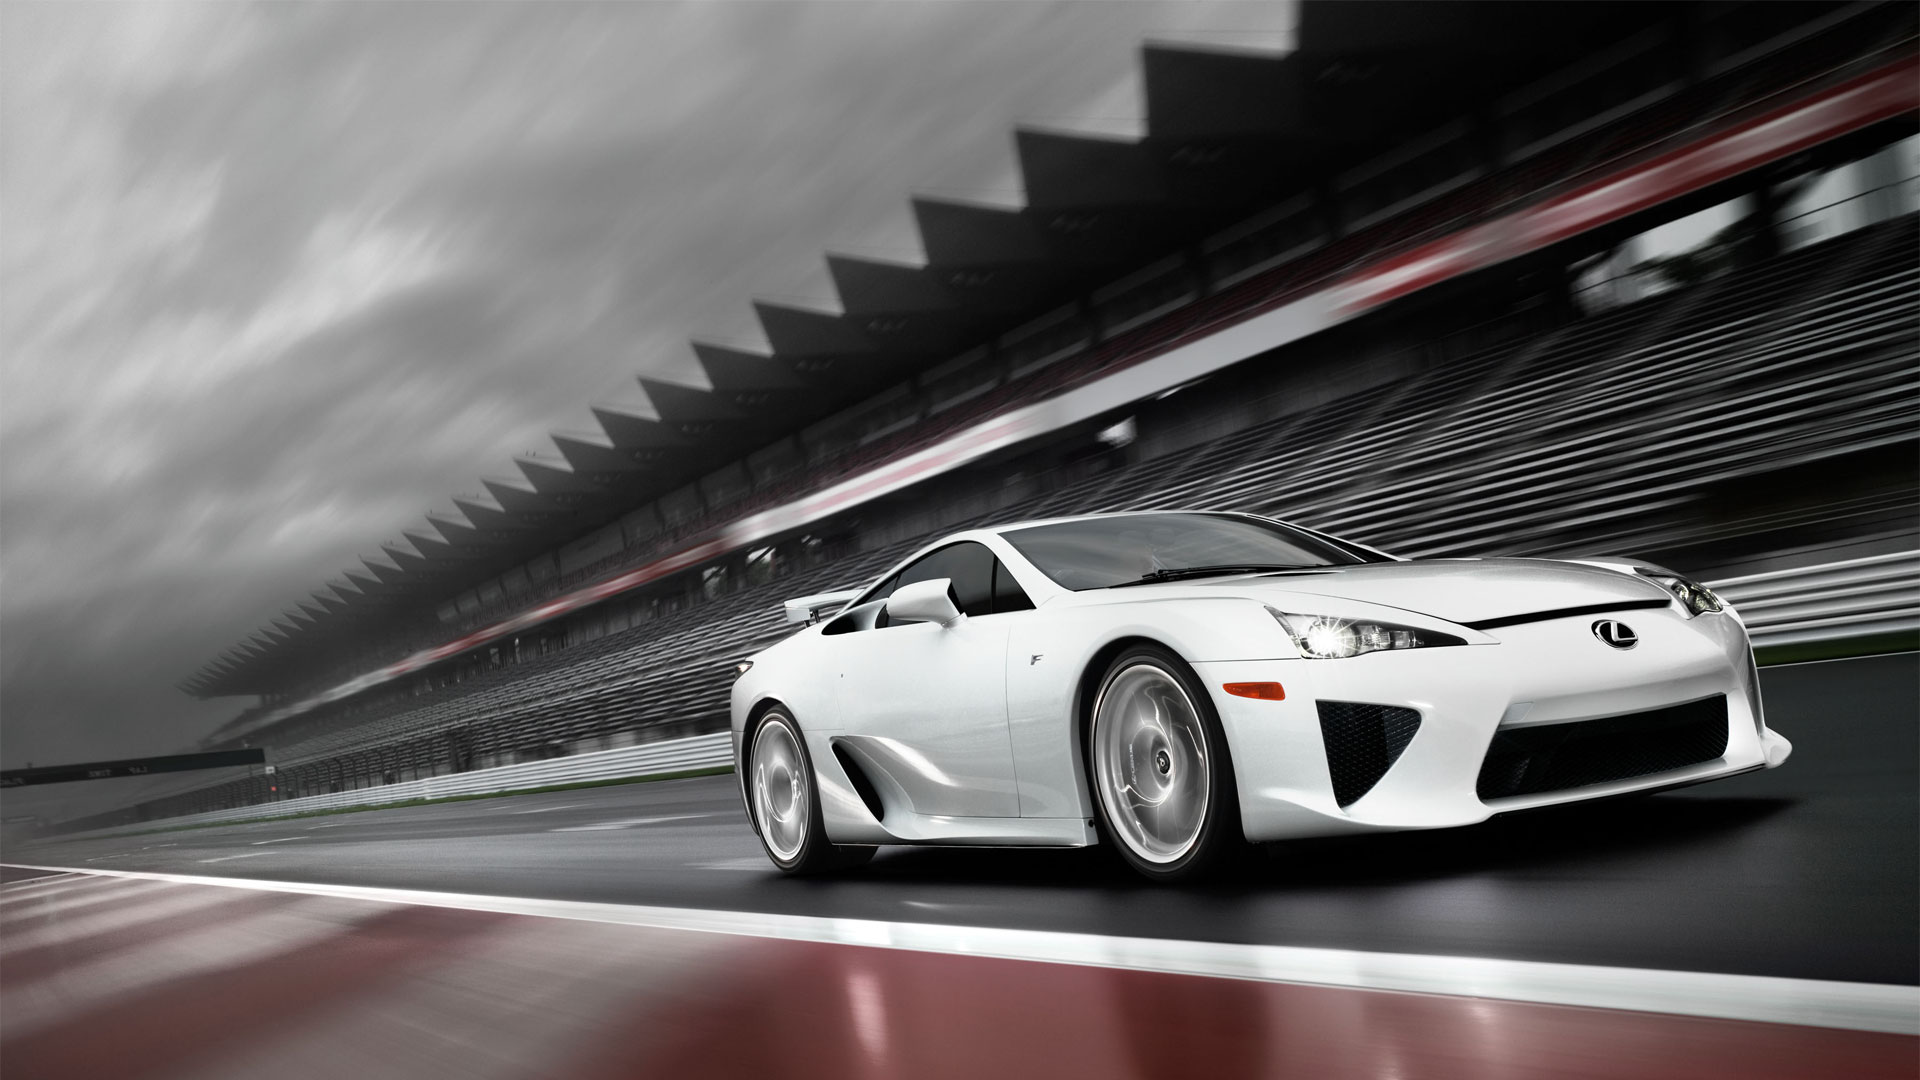 Lexus LFA fond d ecran hd